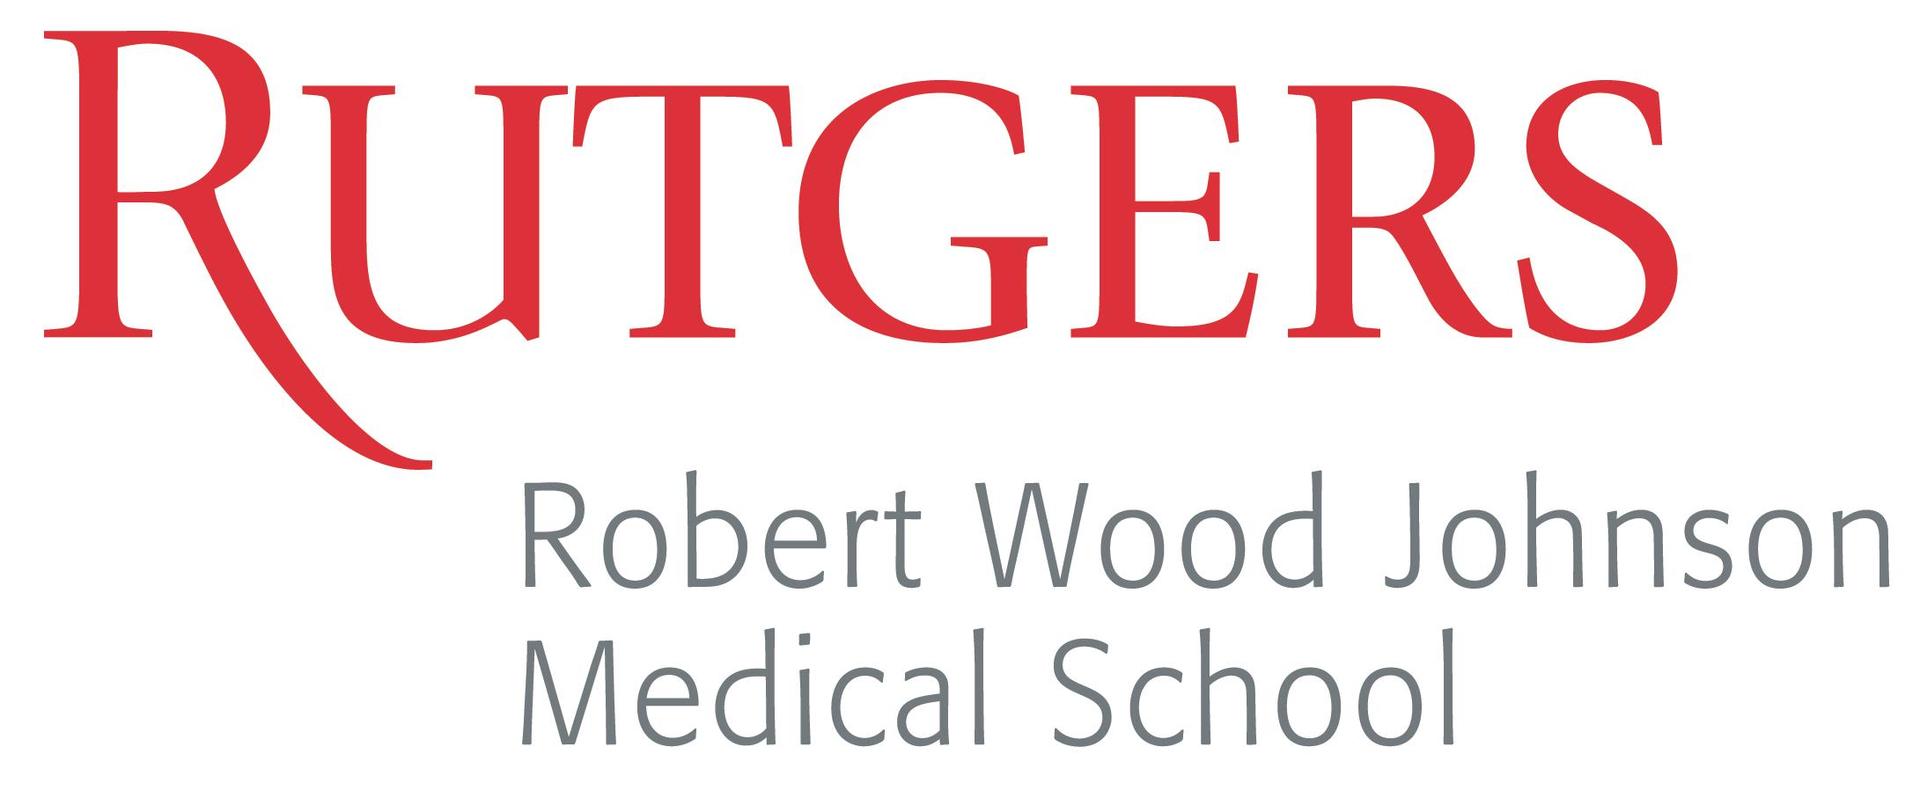 emergency medicine toxicology faculty rutgers robert wood johnson